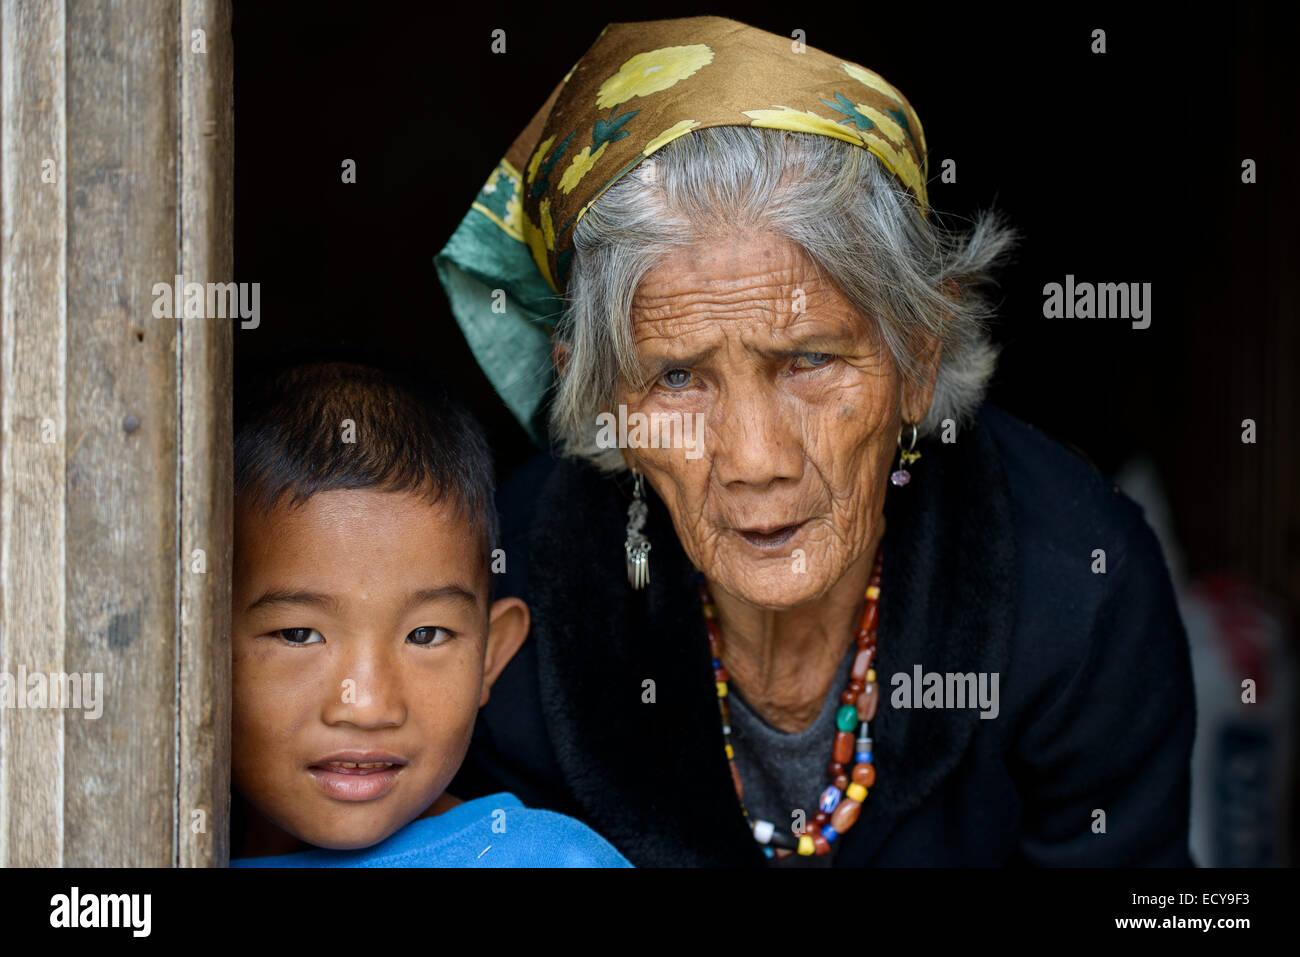 Igorot grandmother and grandchildren, North Luzon, Philippines - Stock Image